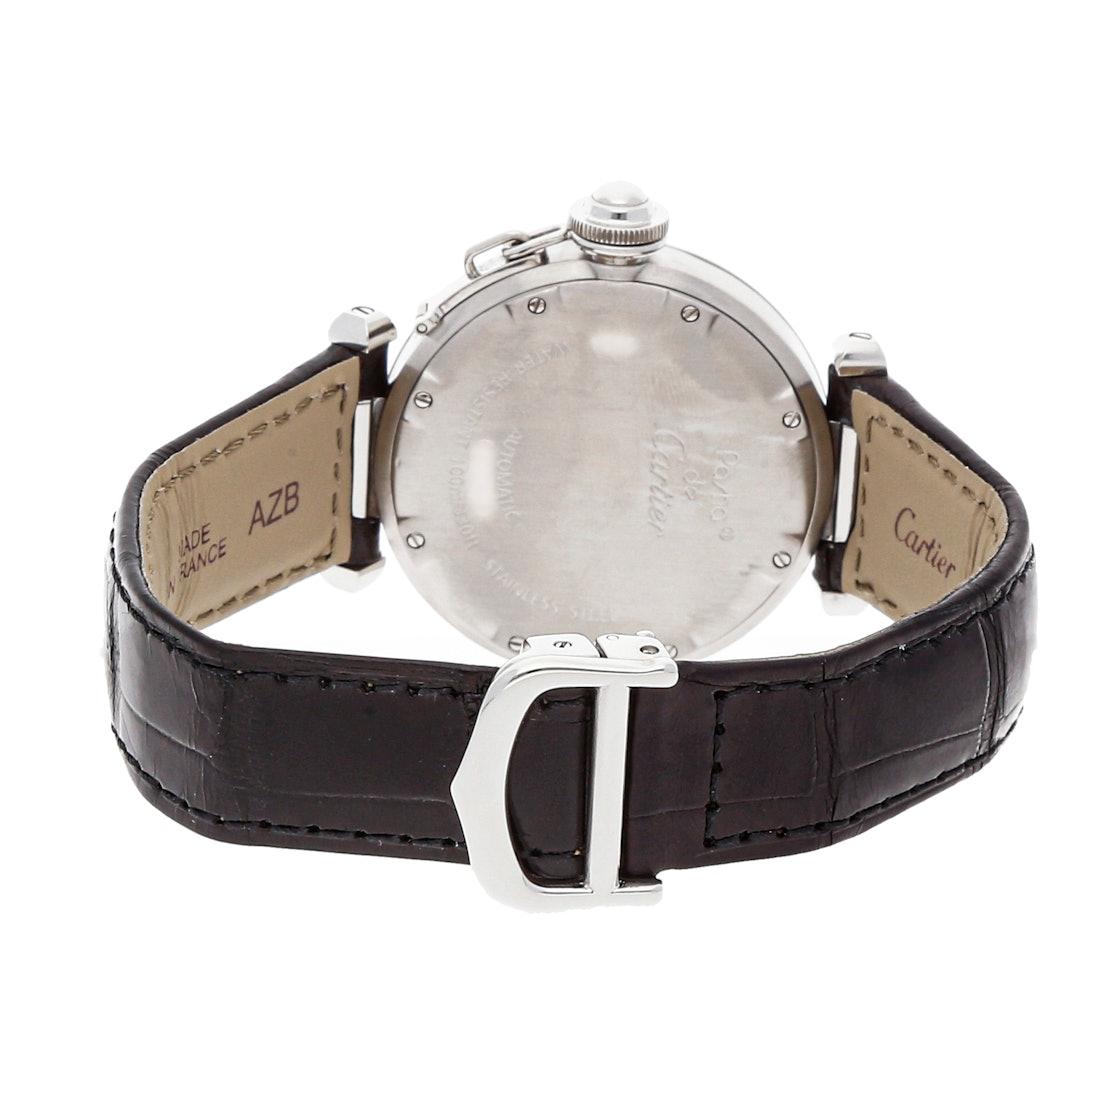 Cartier Pasha C W3104645